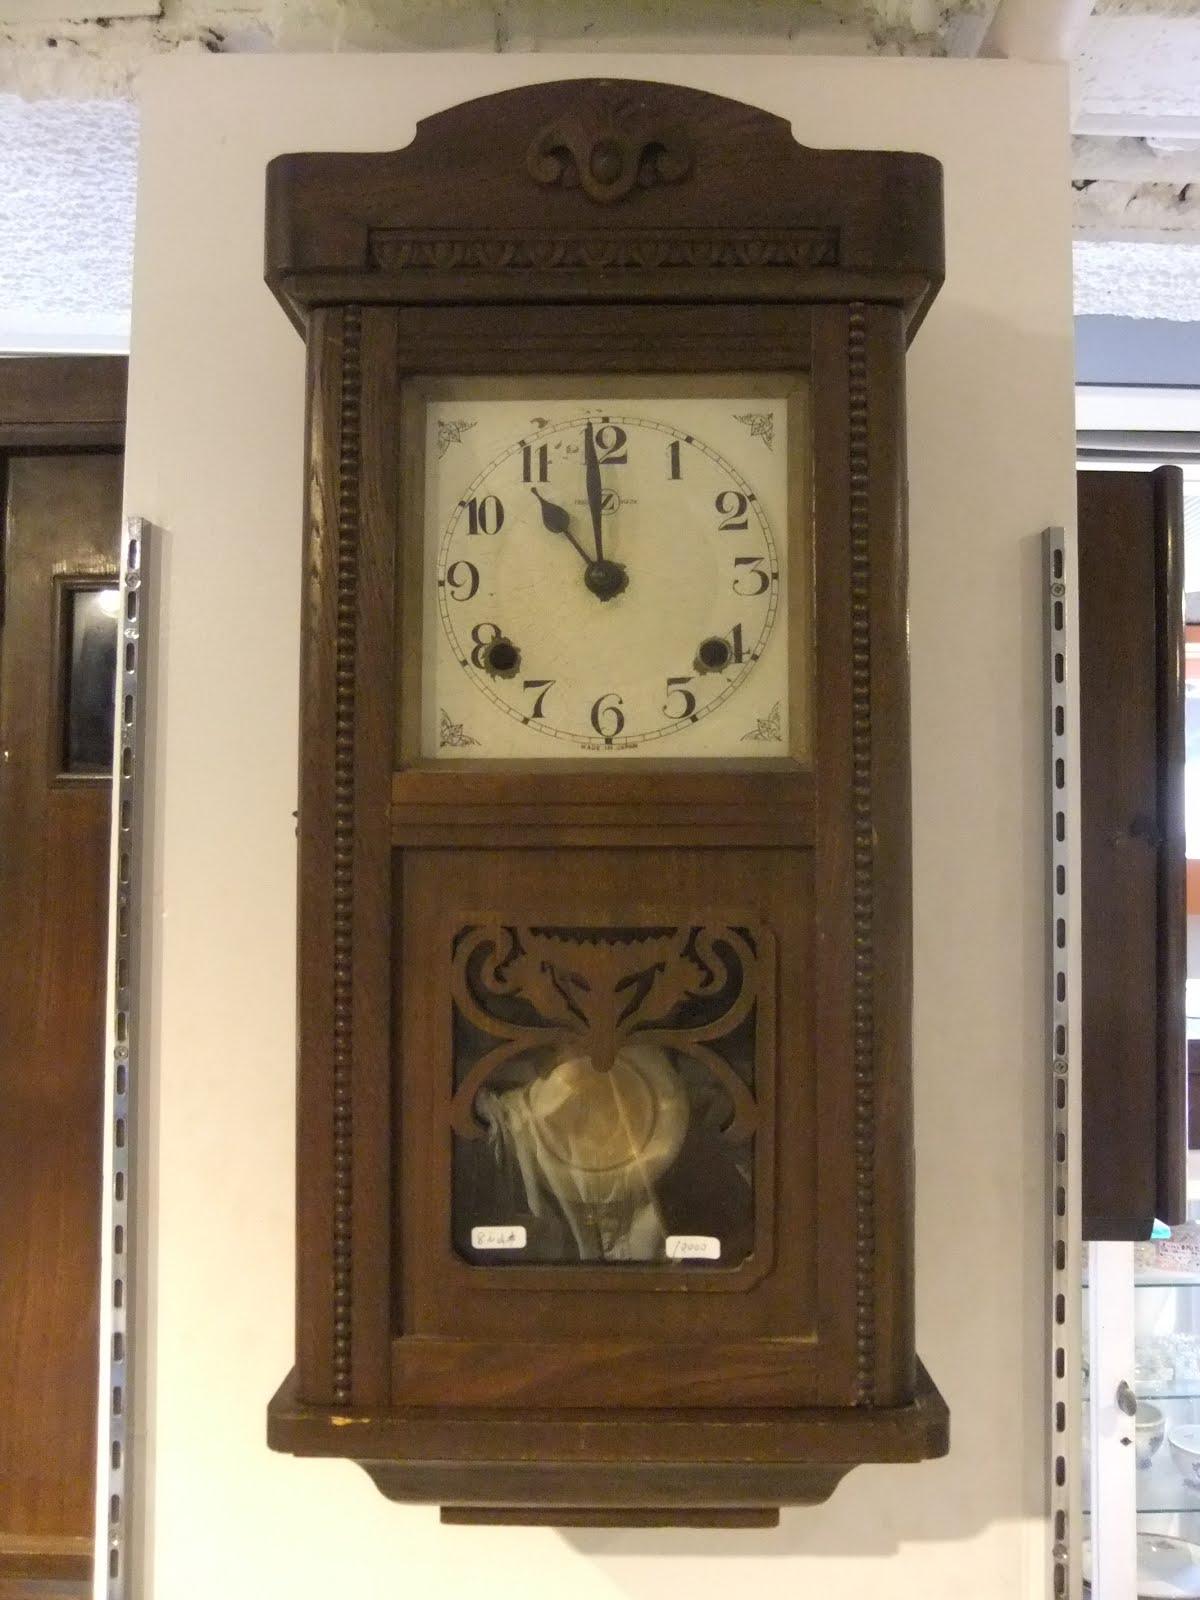 Zマーク掛け時計